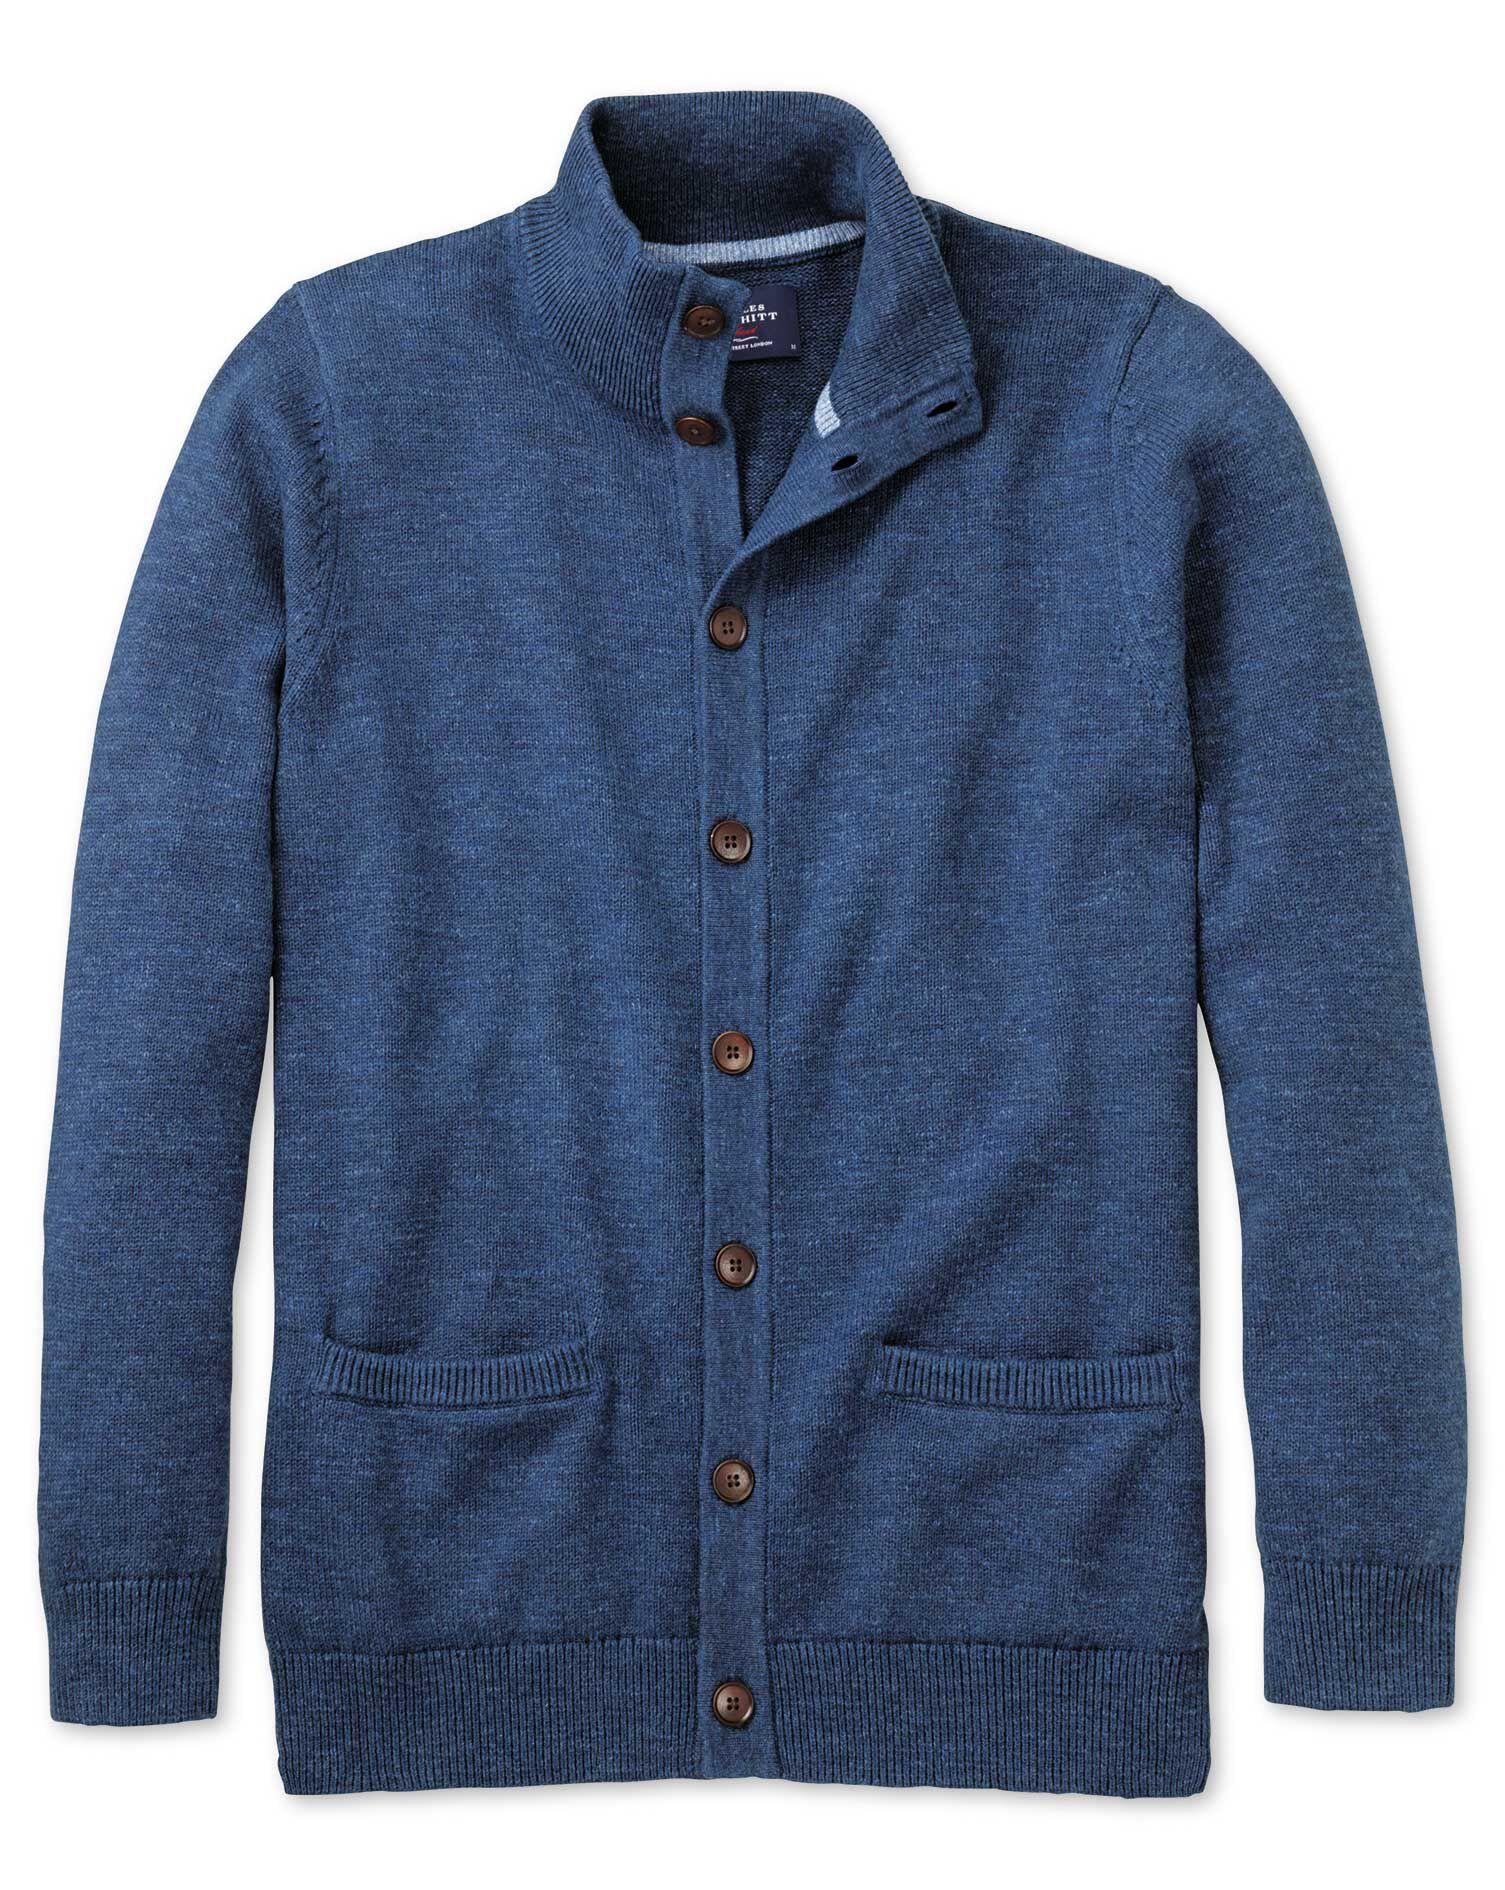 Blue Heather Button Through Cotton Cardigan Size XS by Charles Tyrwhitt